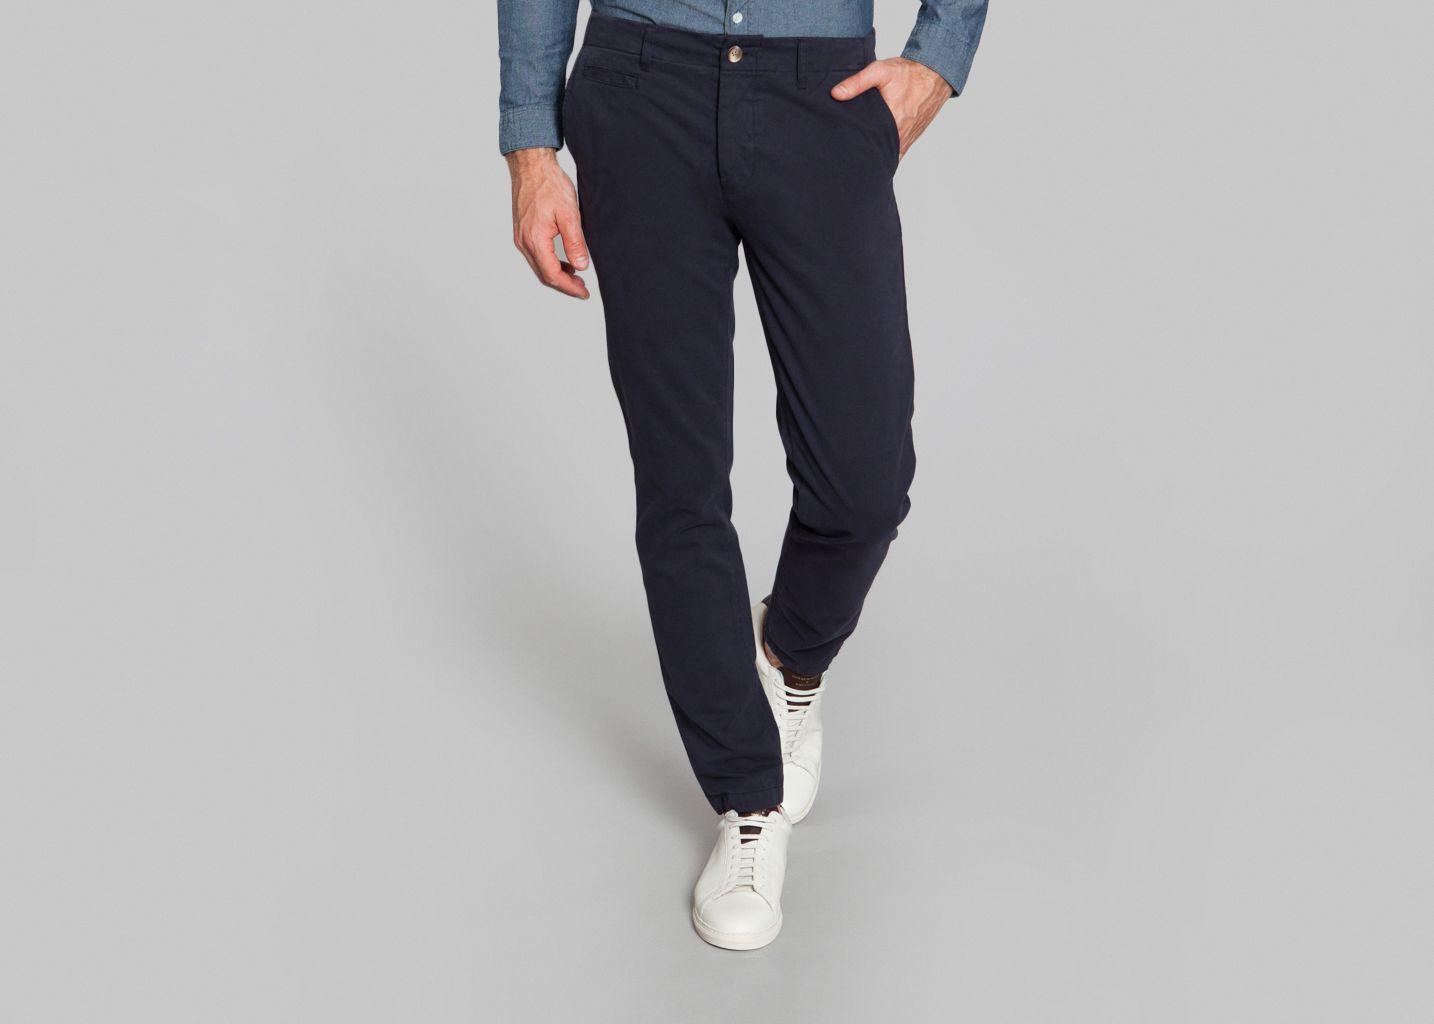 PANTALONES - Pantalones Cuisse de Grenouille rUbui